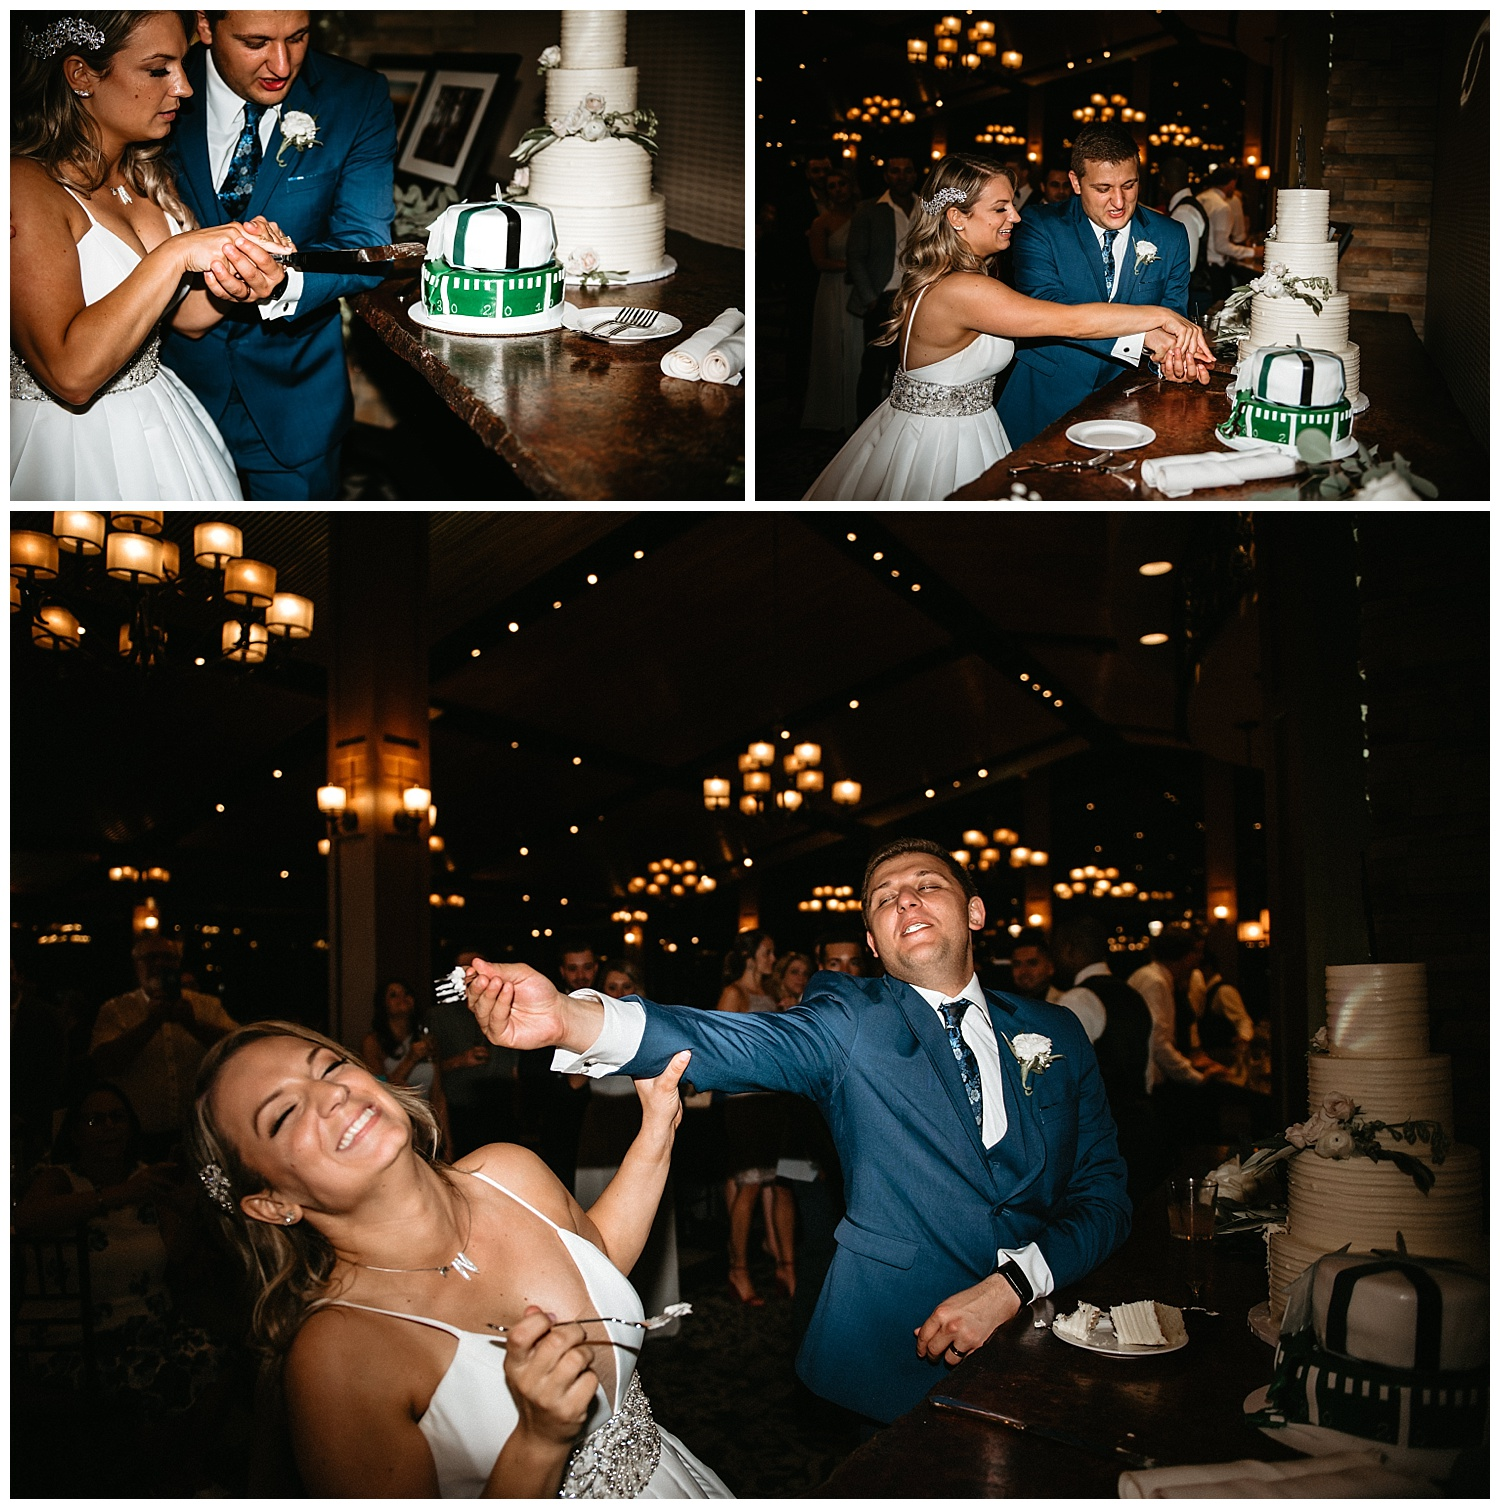 Destination-Wedding-Photographer-in-NEPA-Palmerton-PA_0032.jpg